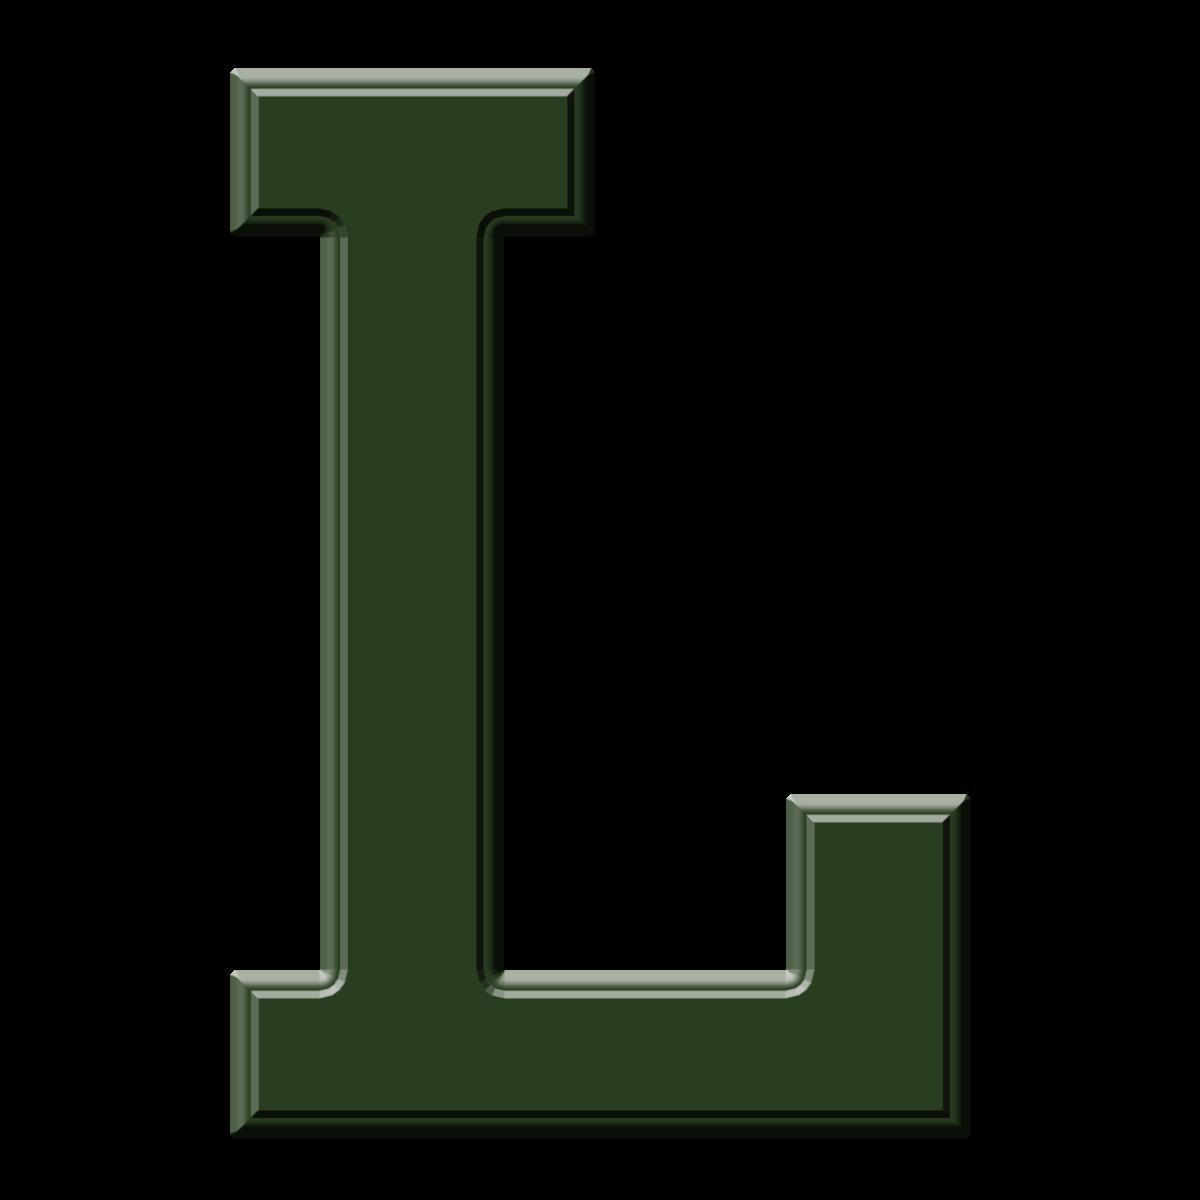 Capital Letter L Template